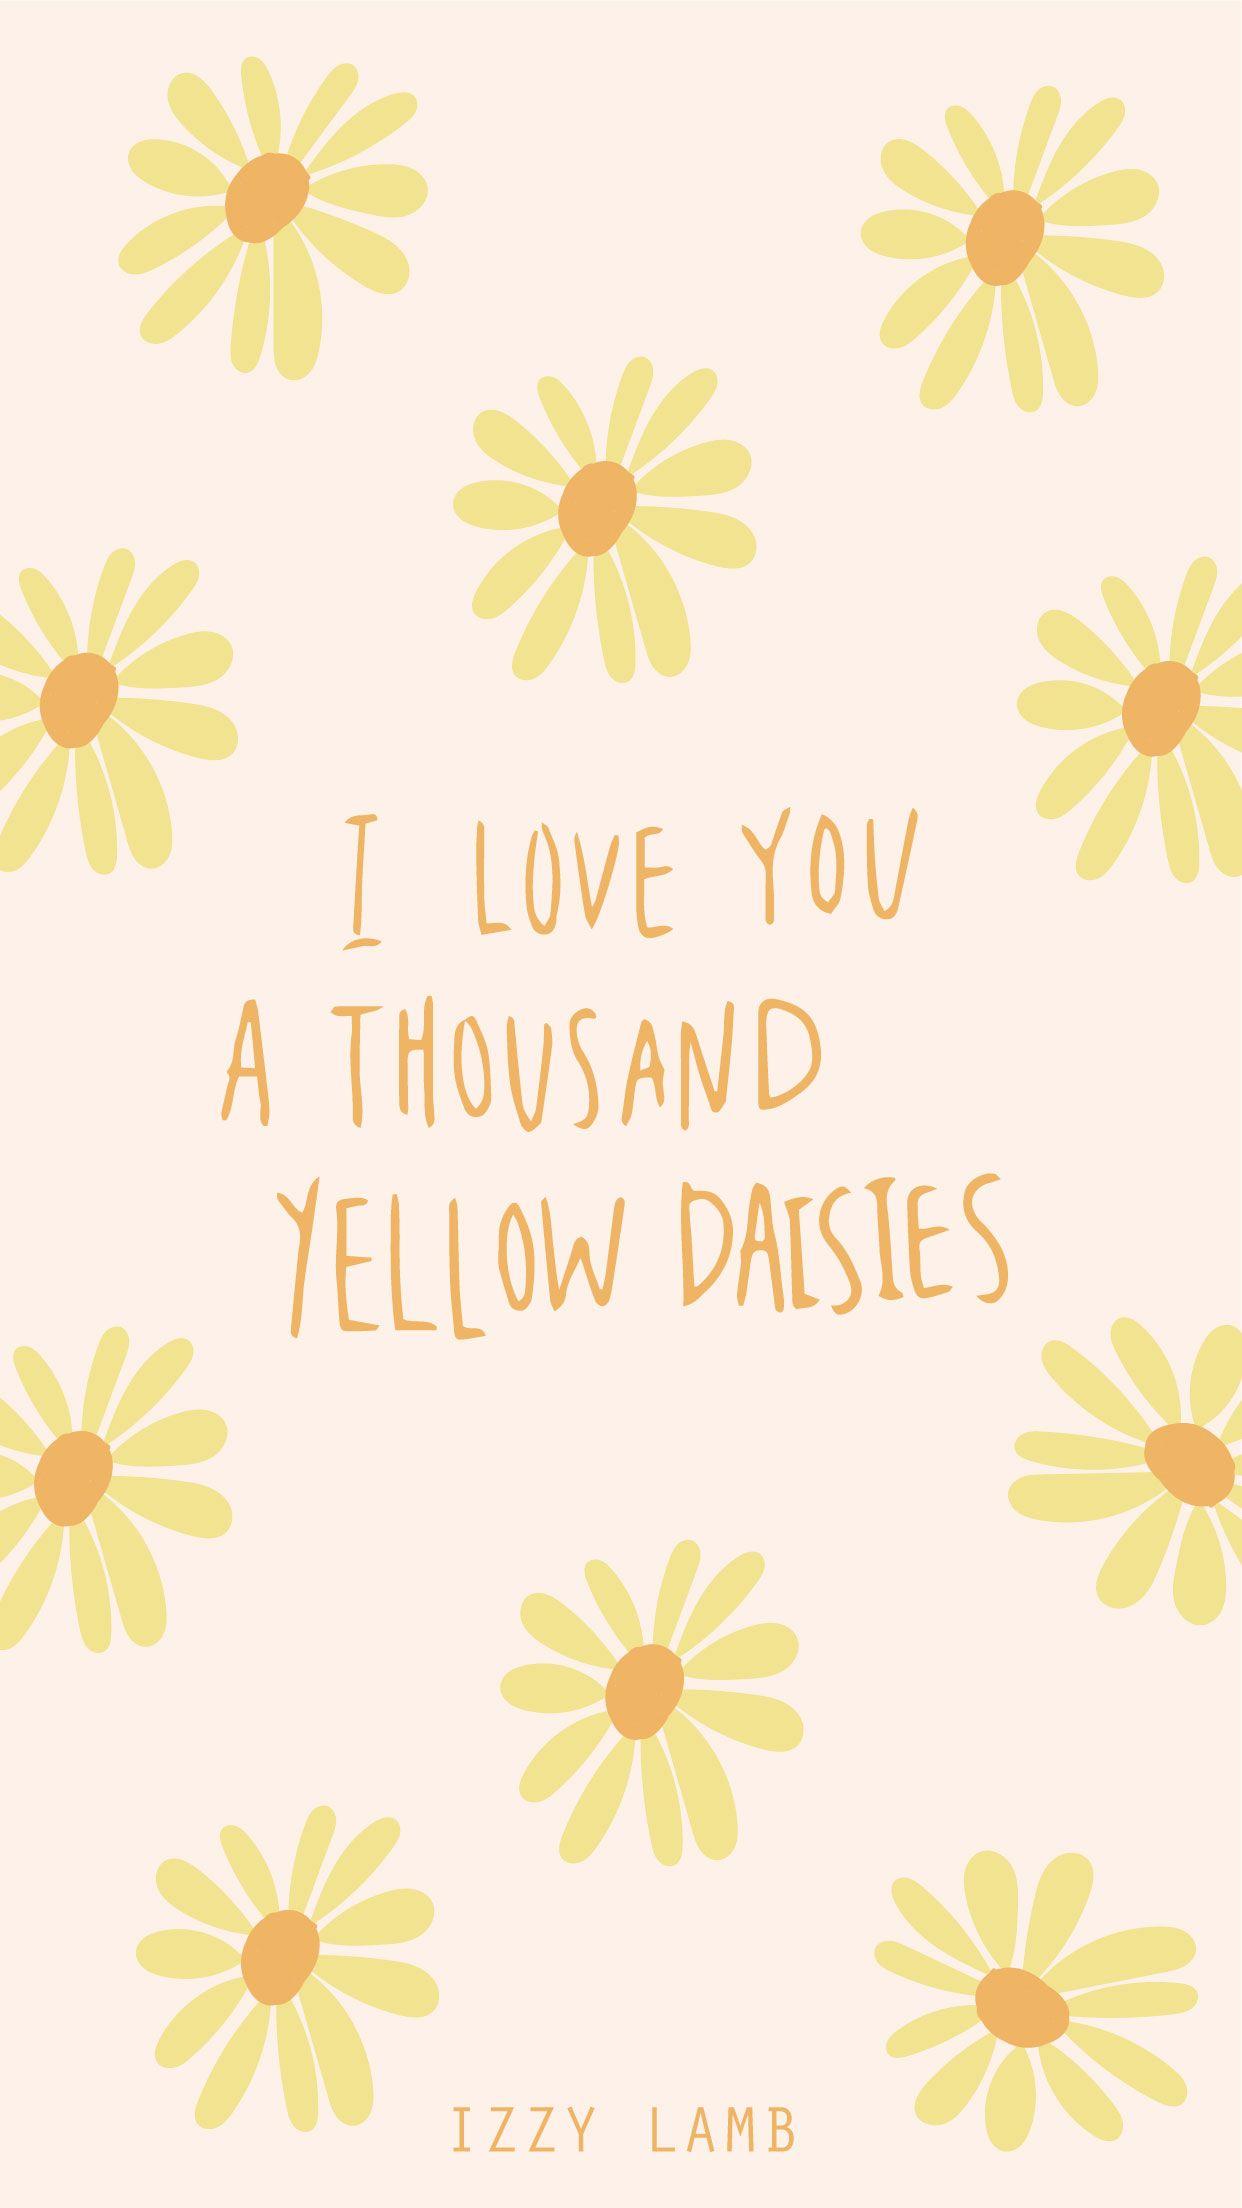 I love you a thousand yellow daisies wallpaper gilmore Kitchen screensaver